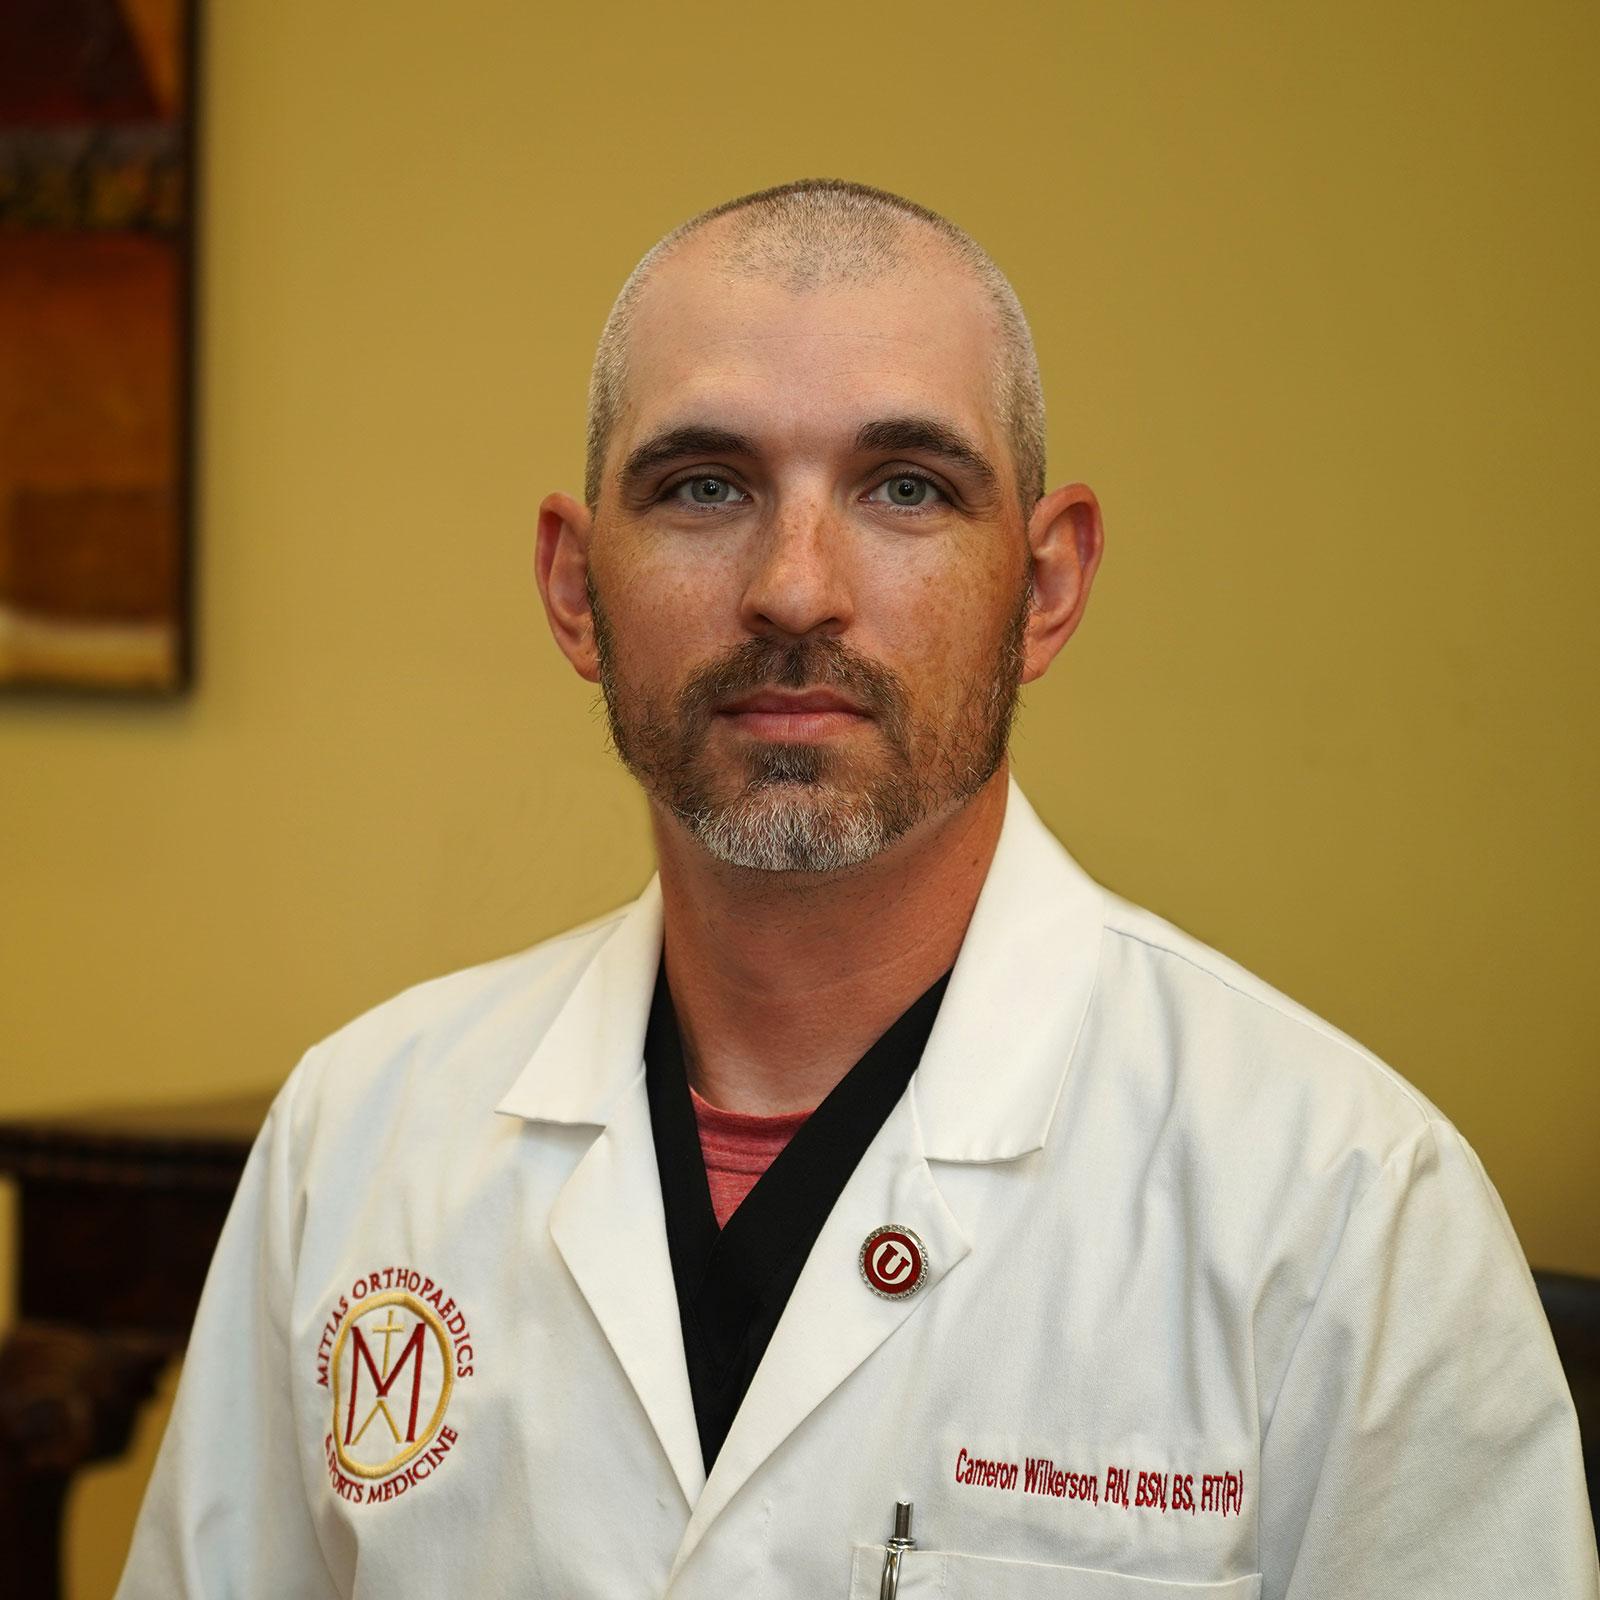 Cameron Wilkerson, RN, BSN, RT(R)